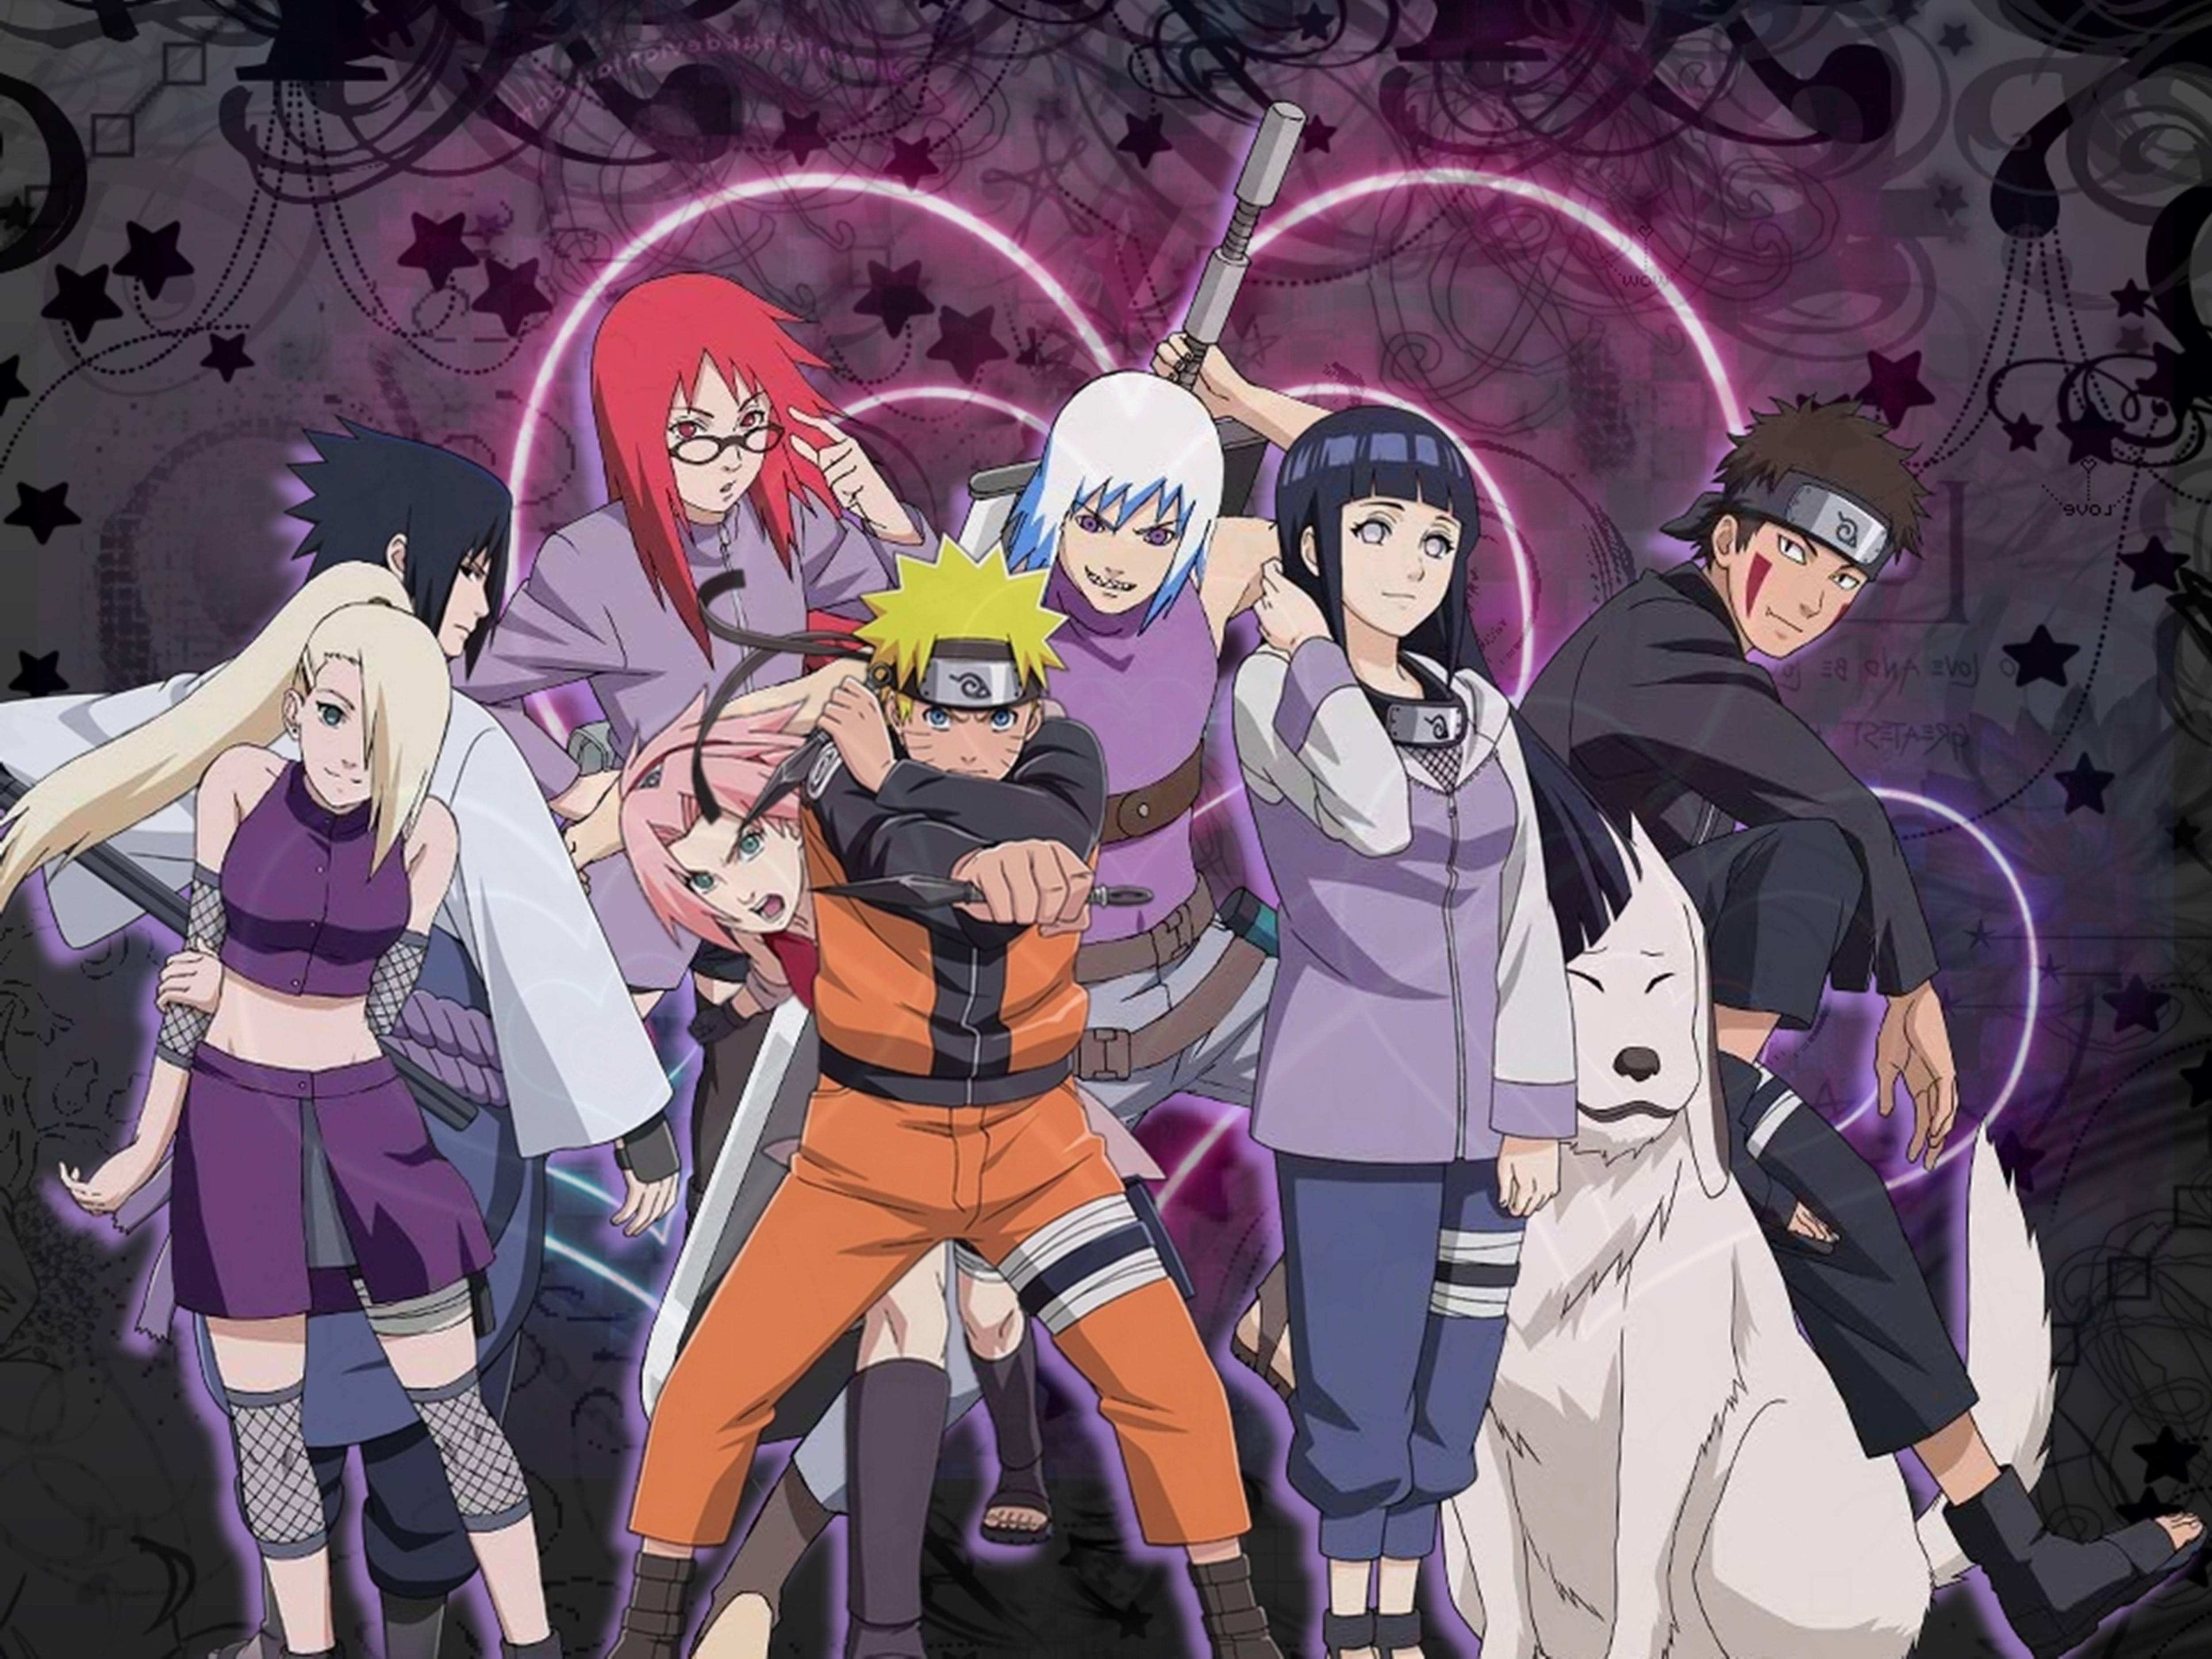 Amazing Wallpaper Naruto Purple - AXBjd6d  Graphic_563839.jpg